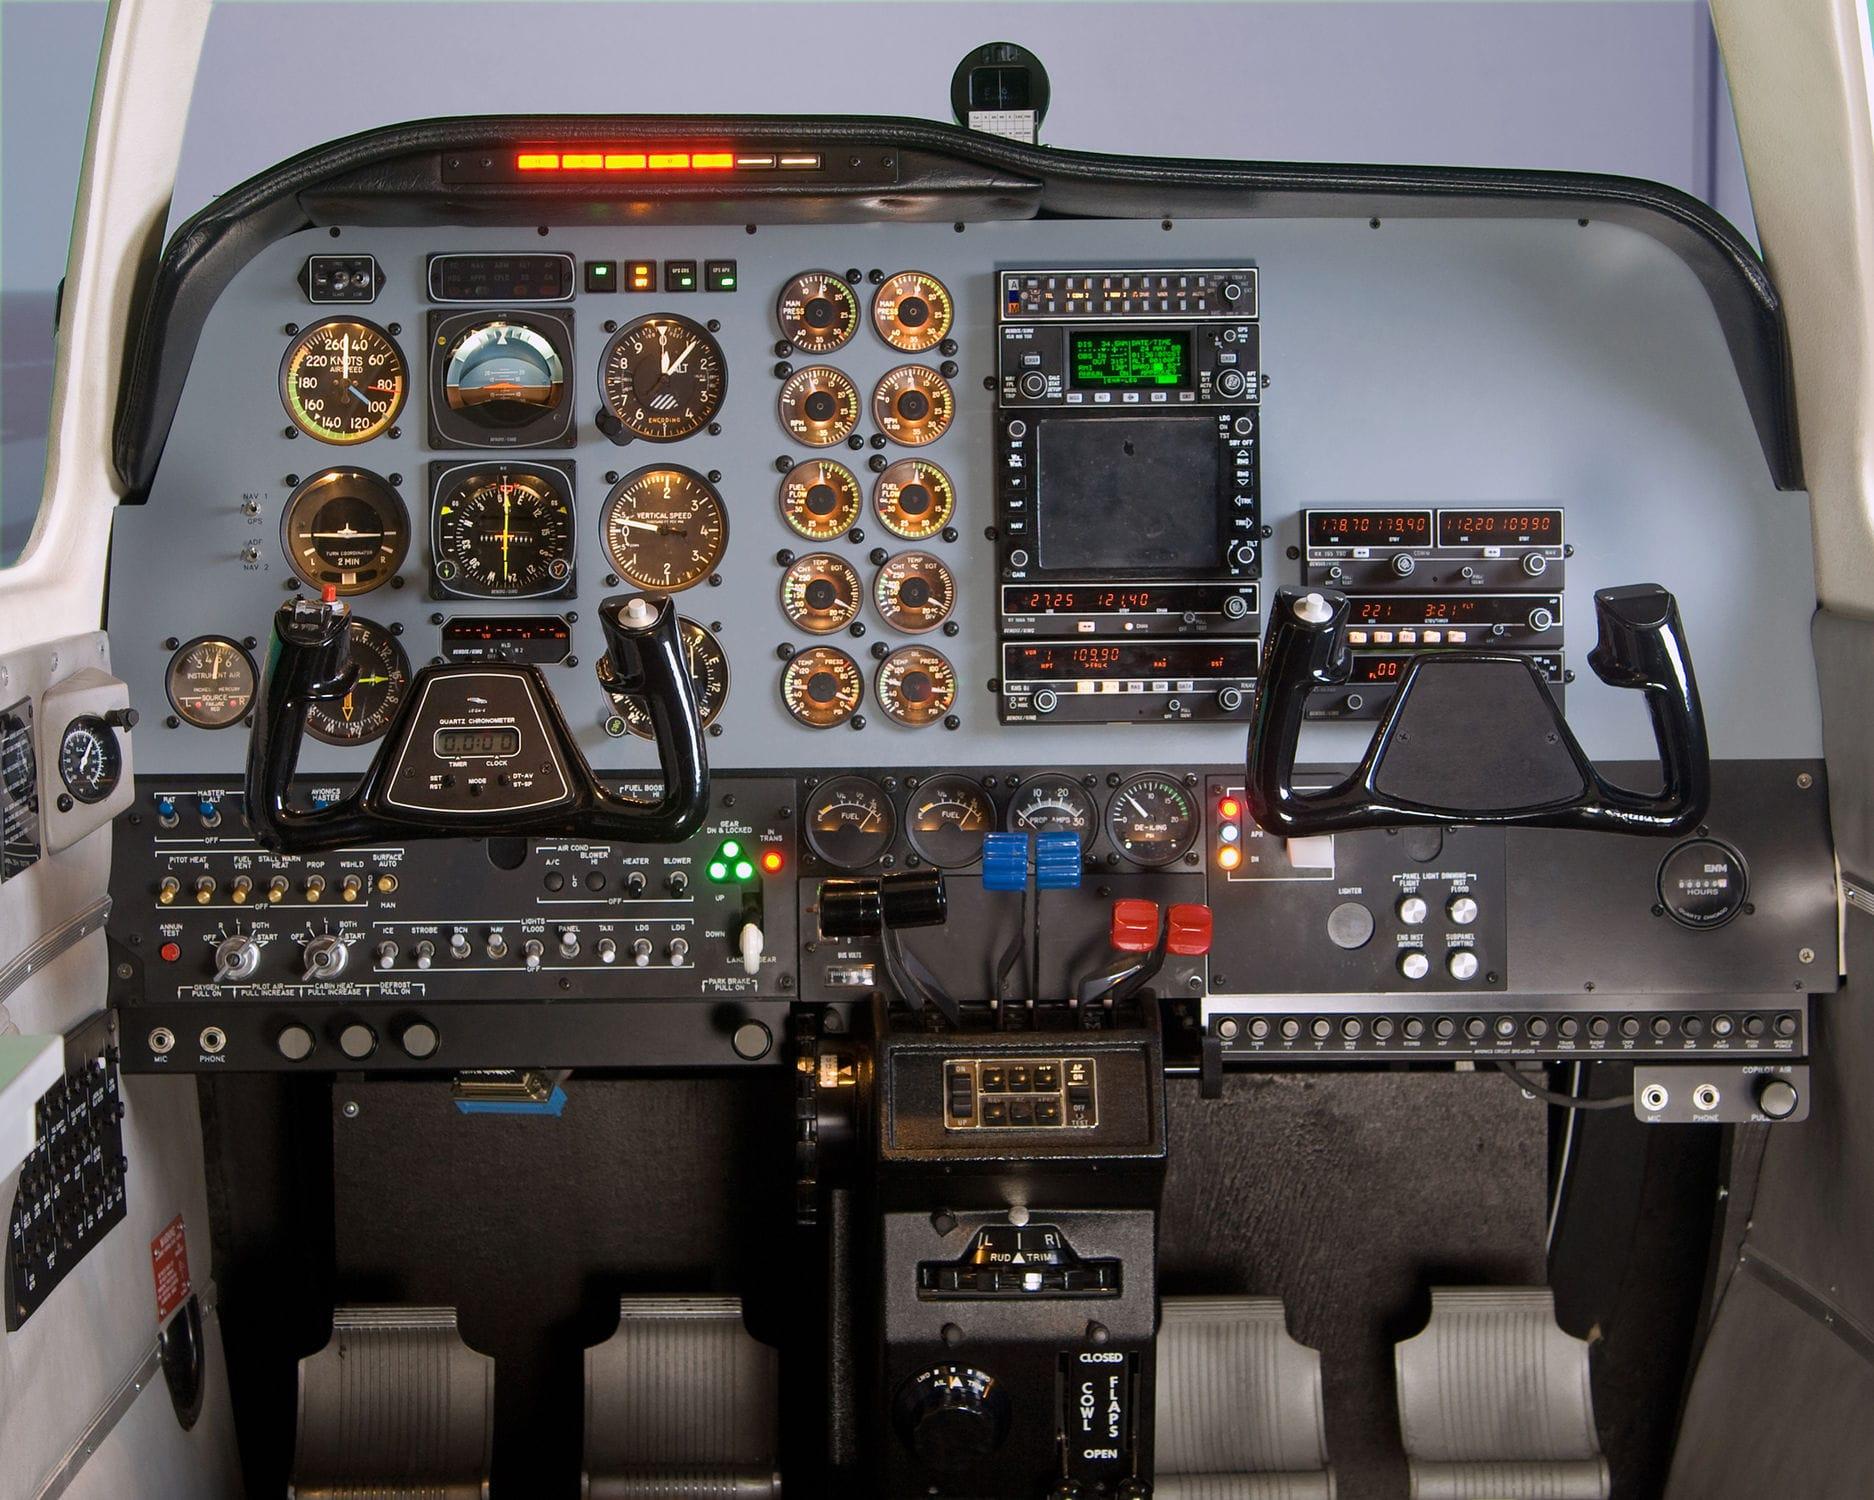 Flight simulator / cockpit SIMCOM Aviation Training